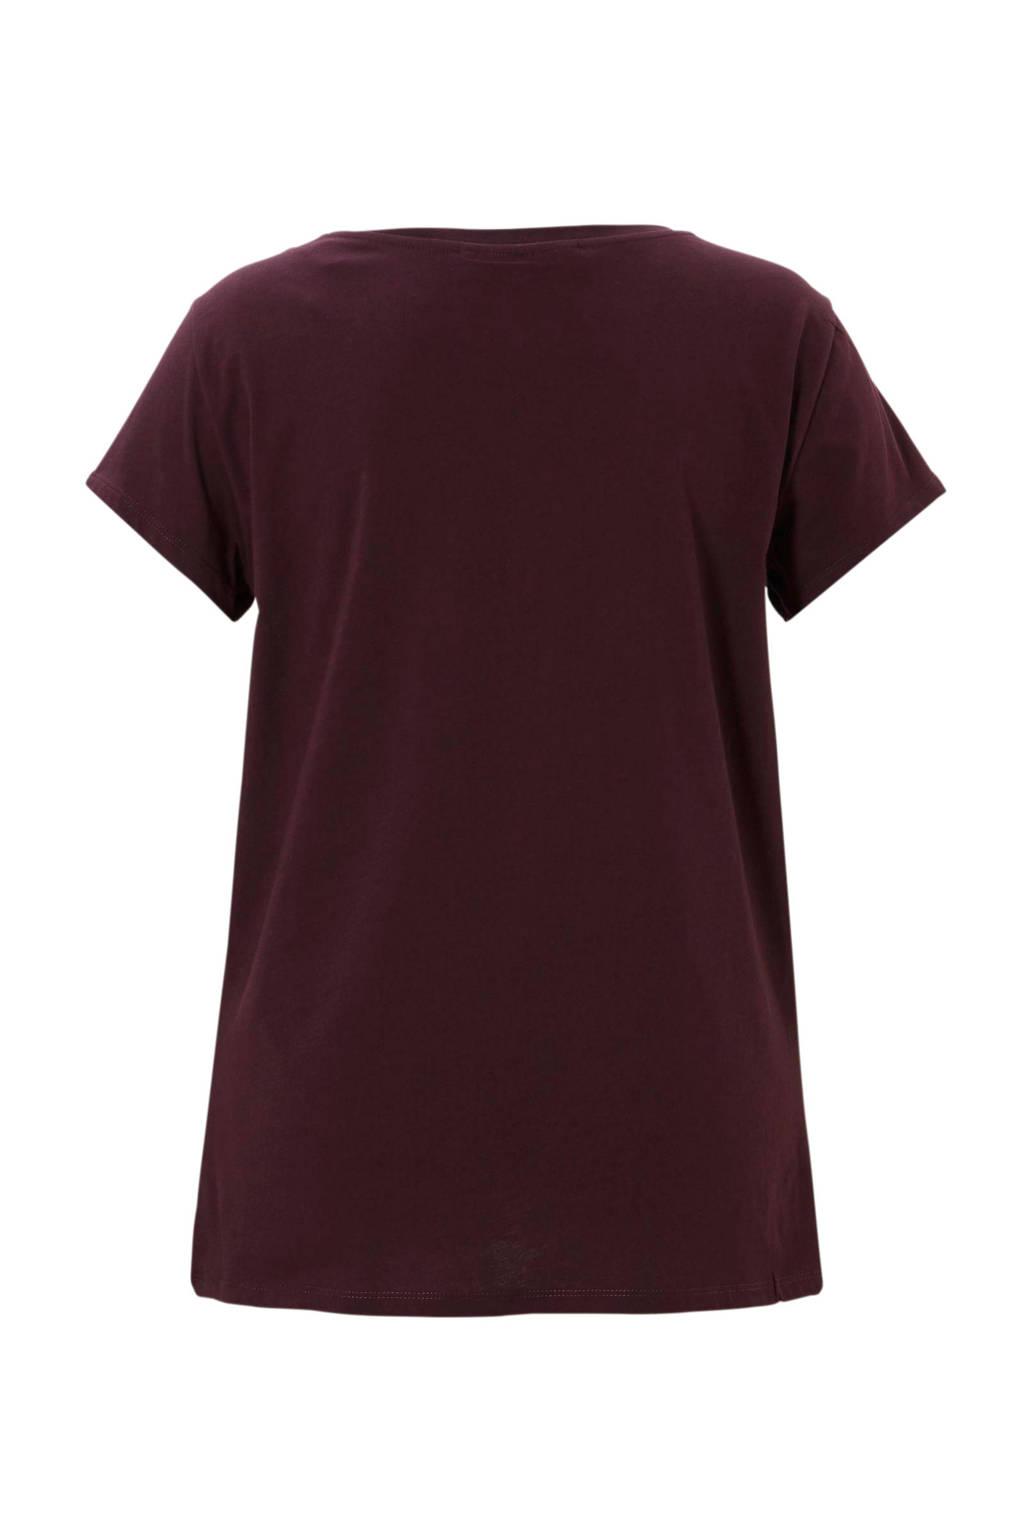 amp;axl T Met shirt Clockhouse Bordeaux C Borduursel OPqFwdw